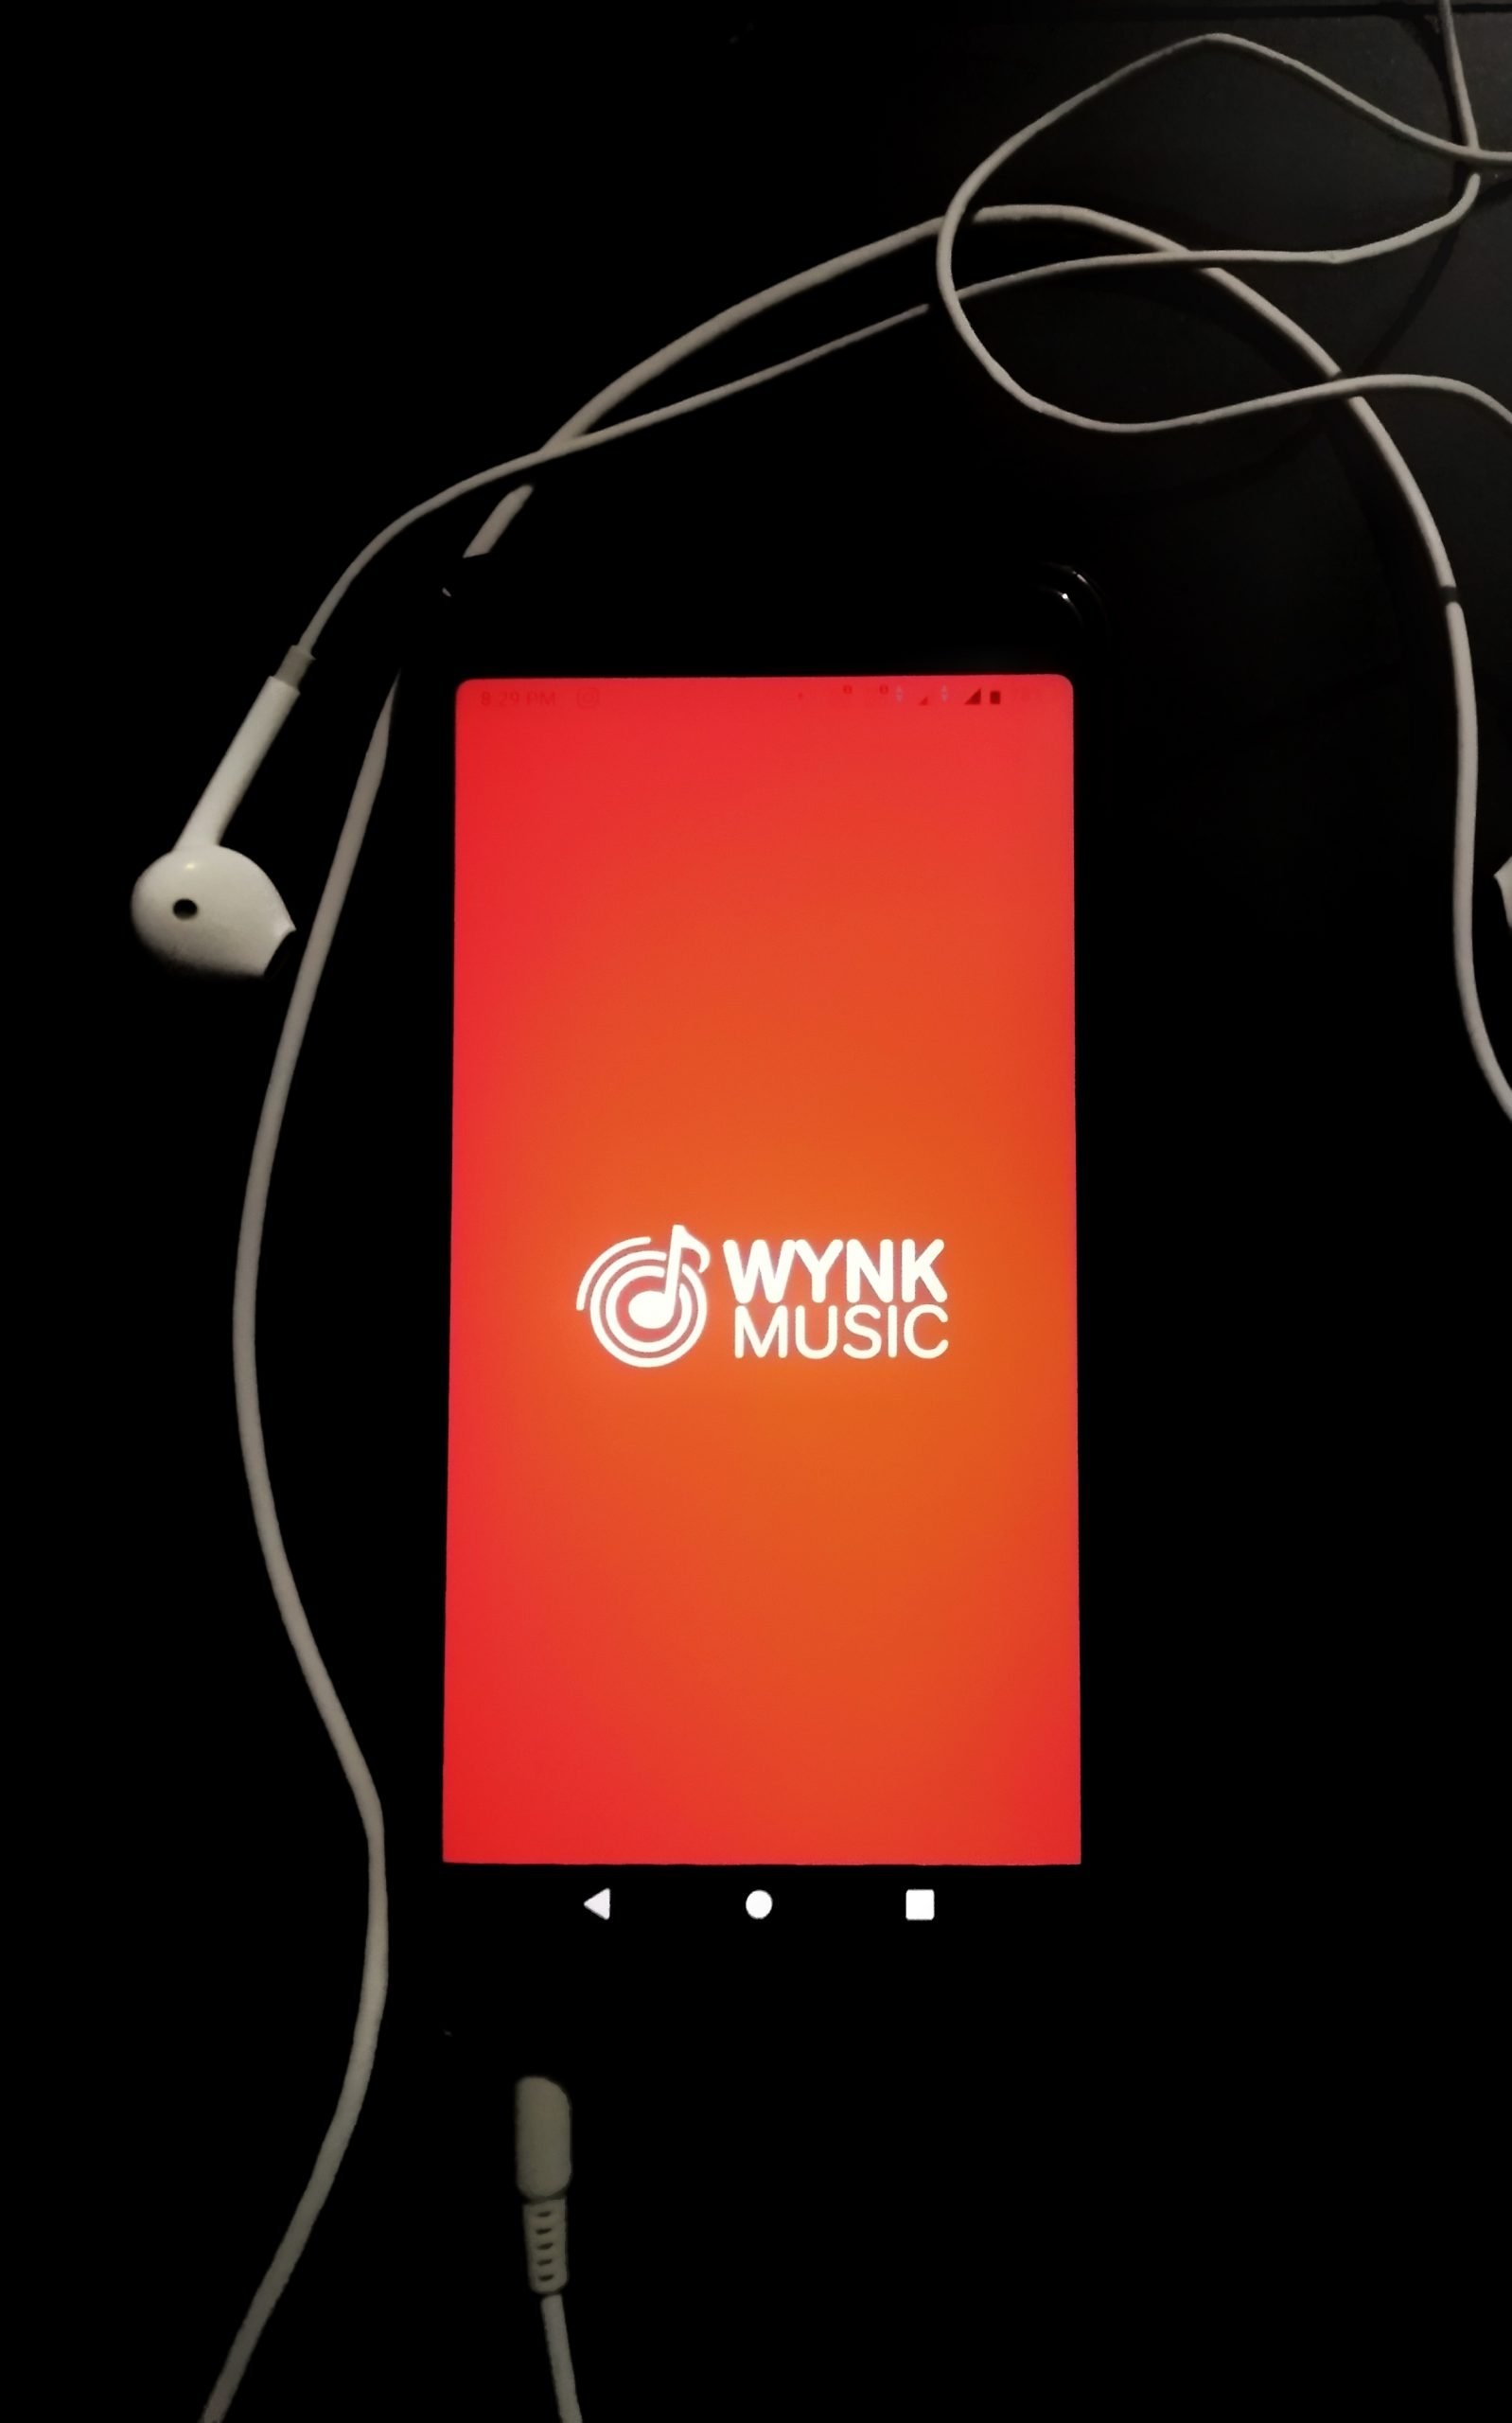 Listening Wynk Music